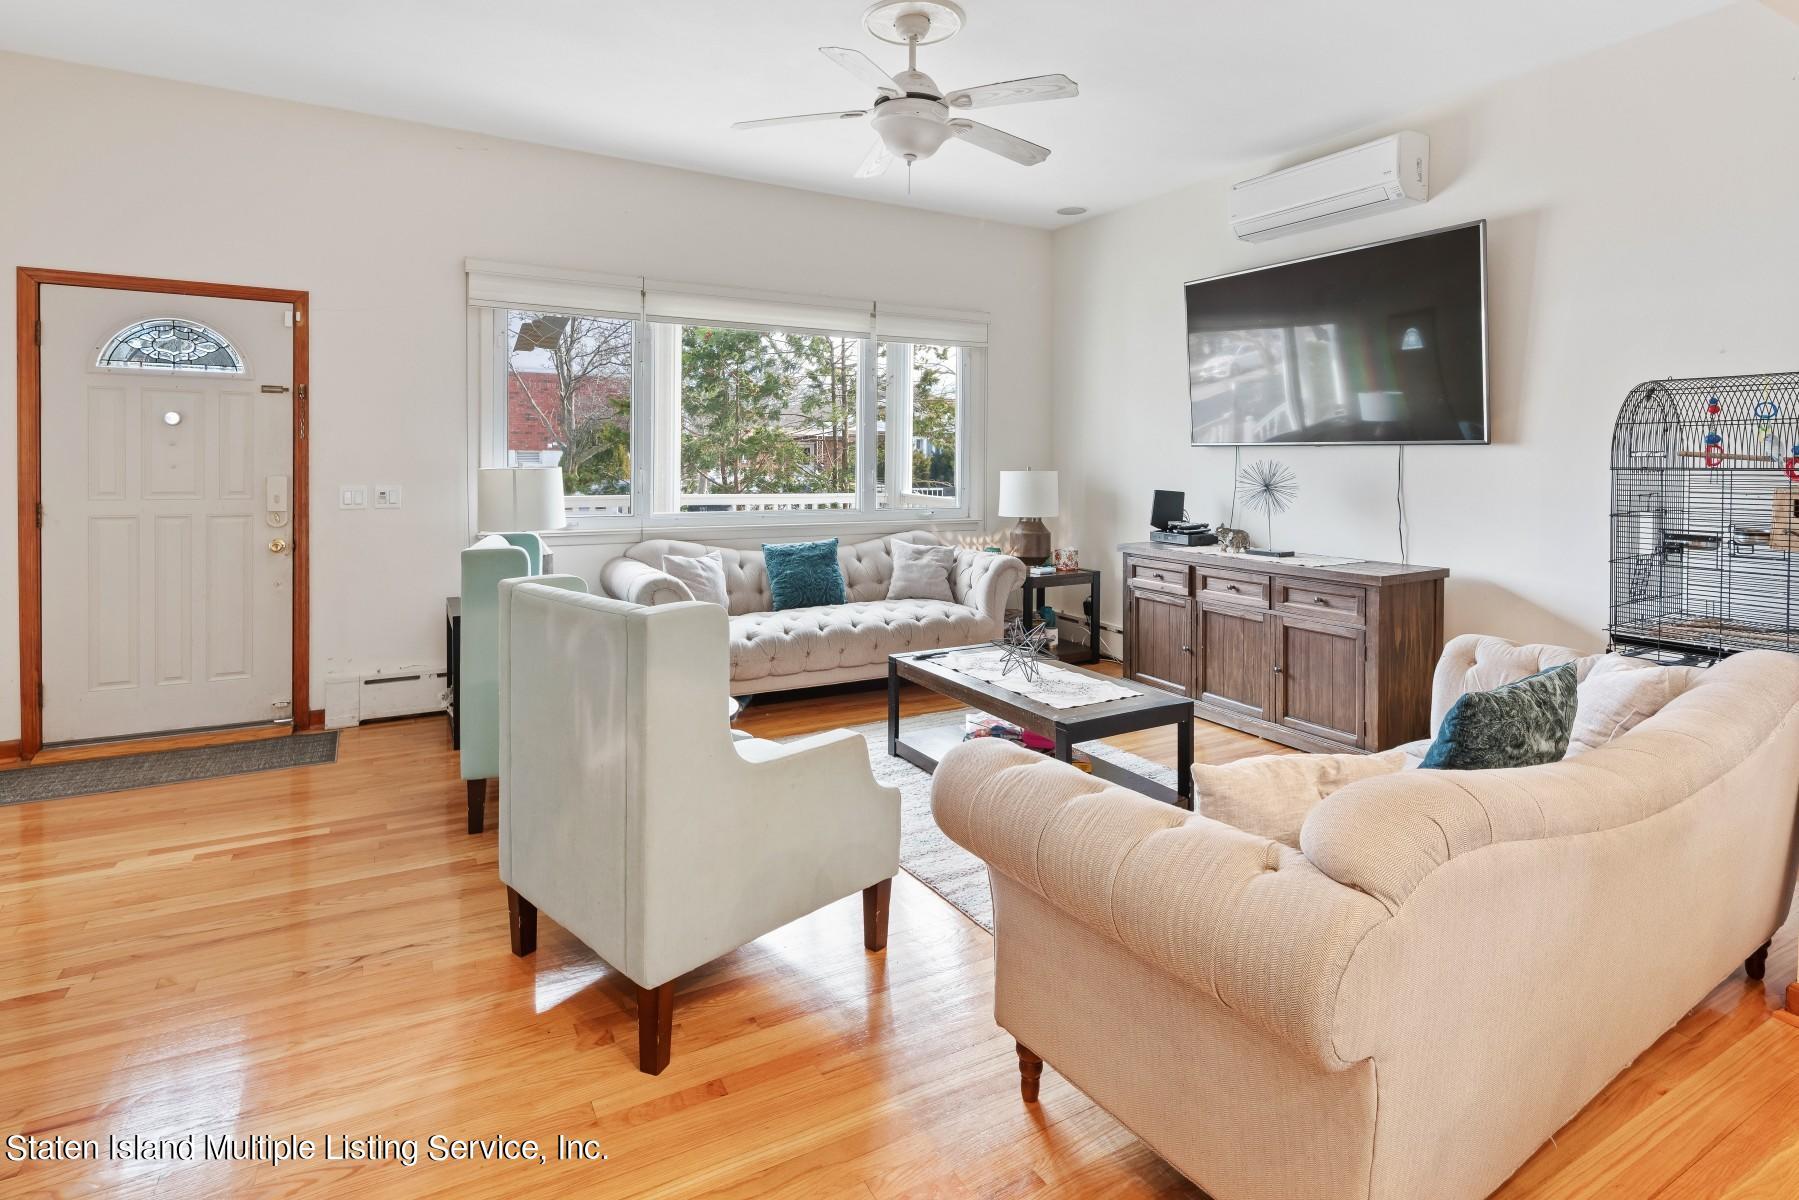 Single Family - Detached 8 Bionia Avenue  Staten Island, NY 10305, MLS-1142818-5